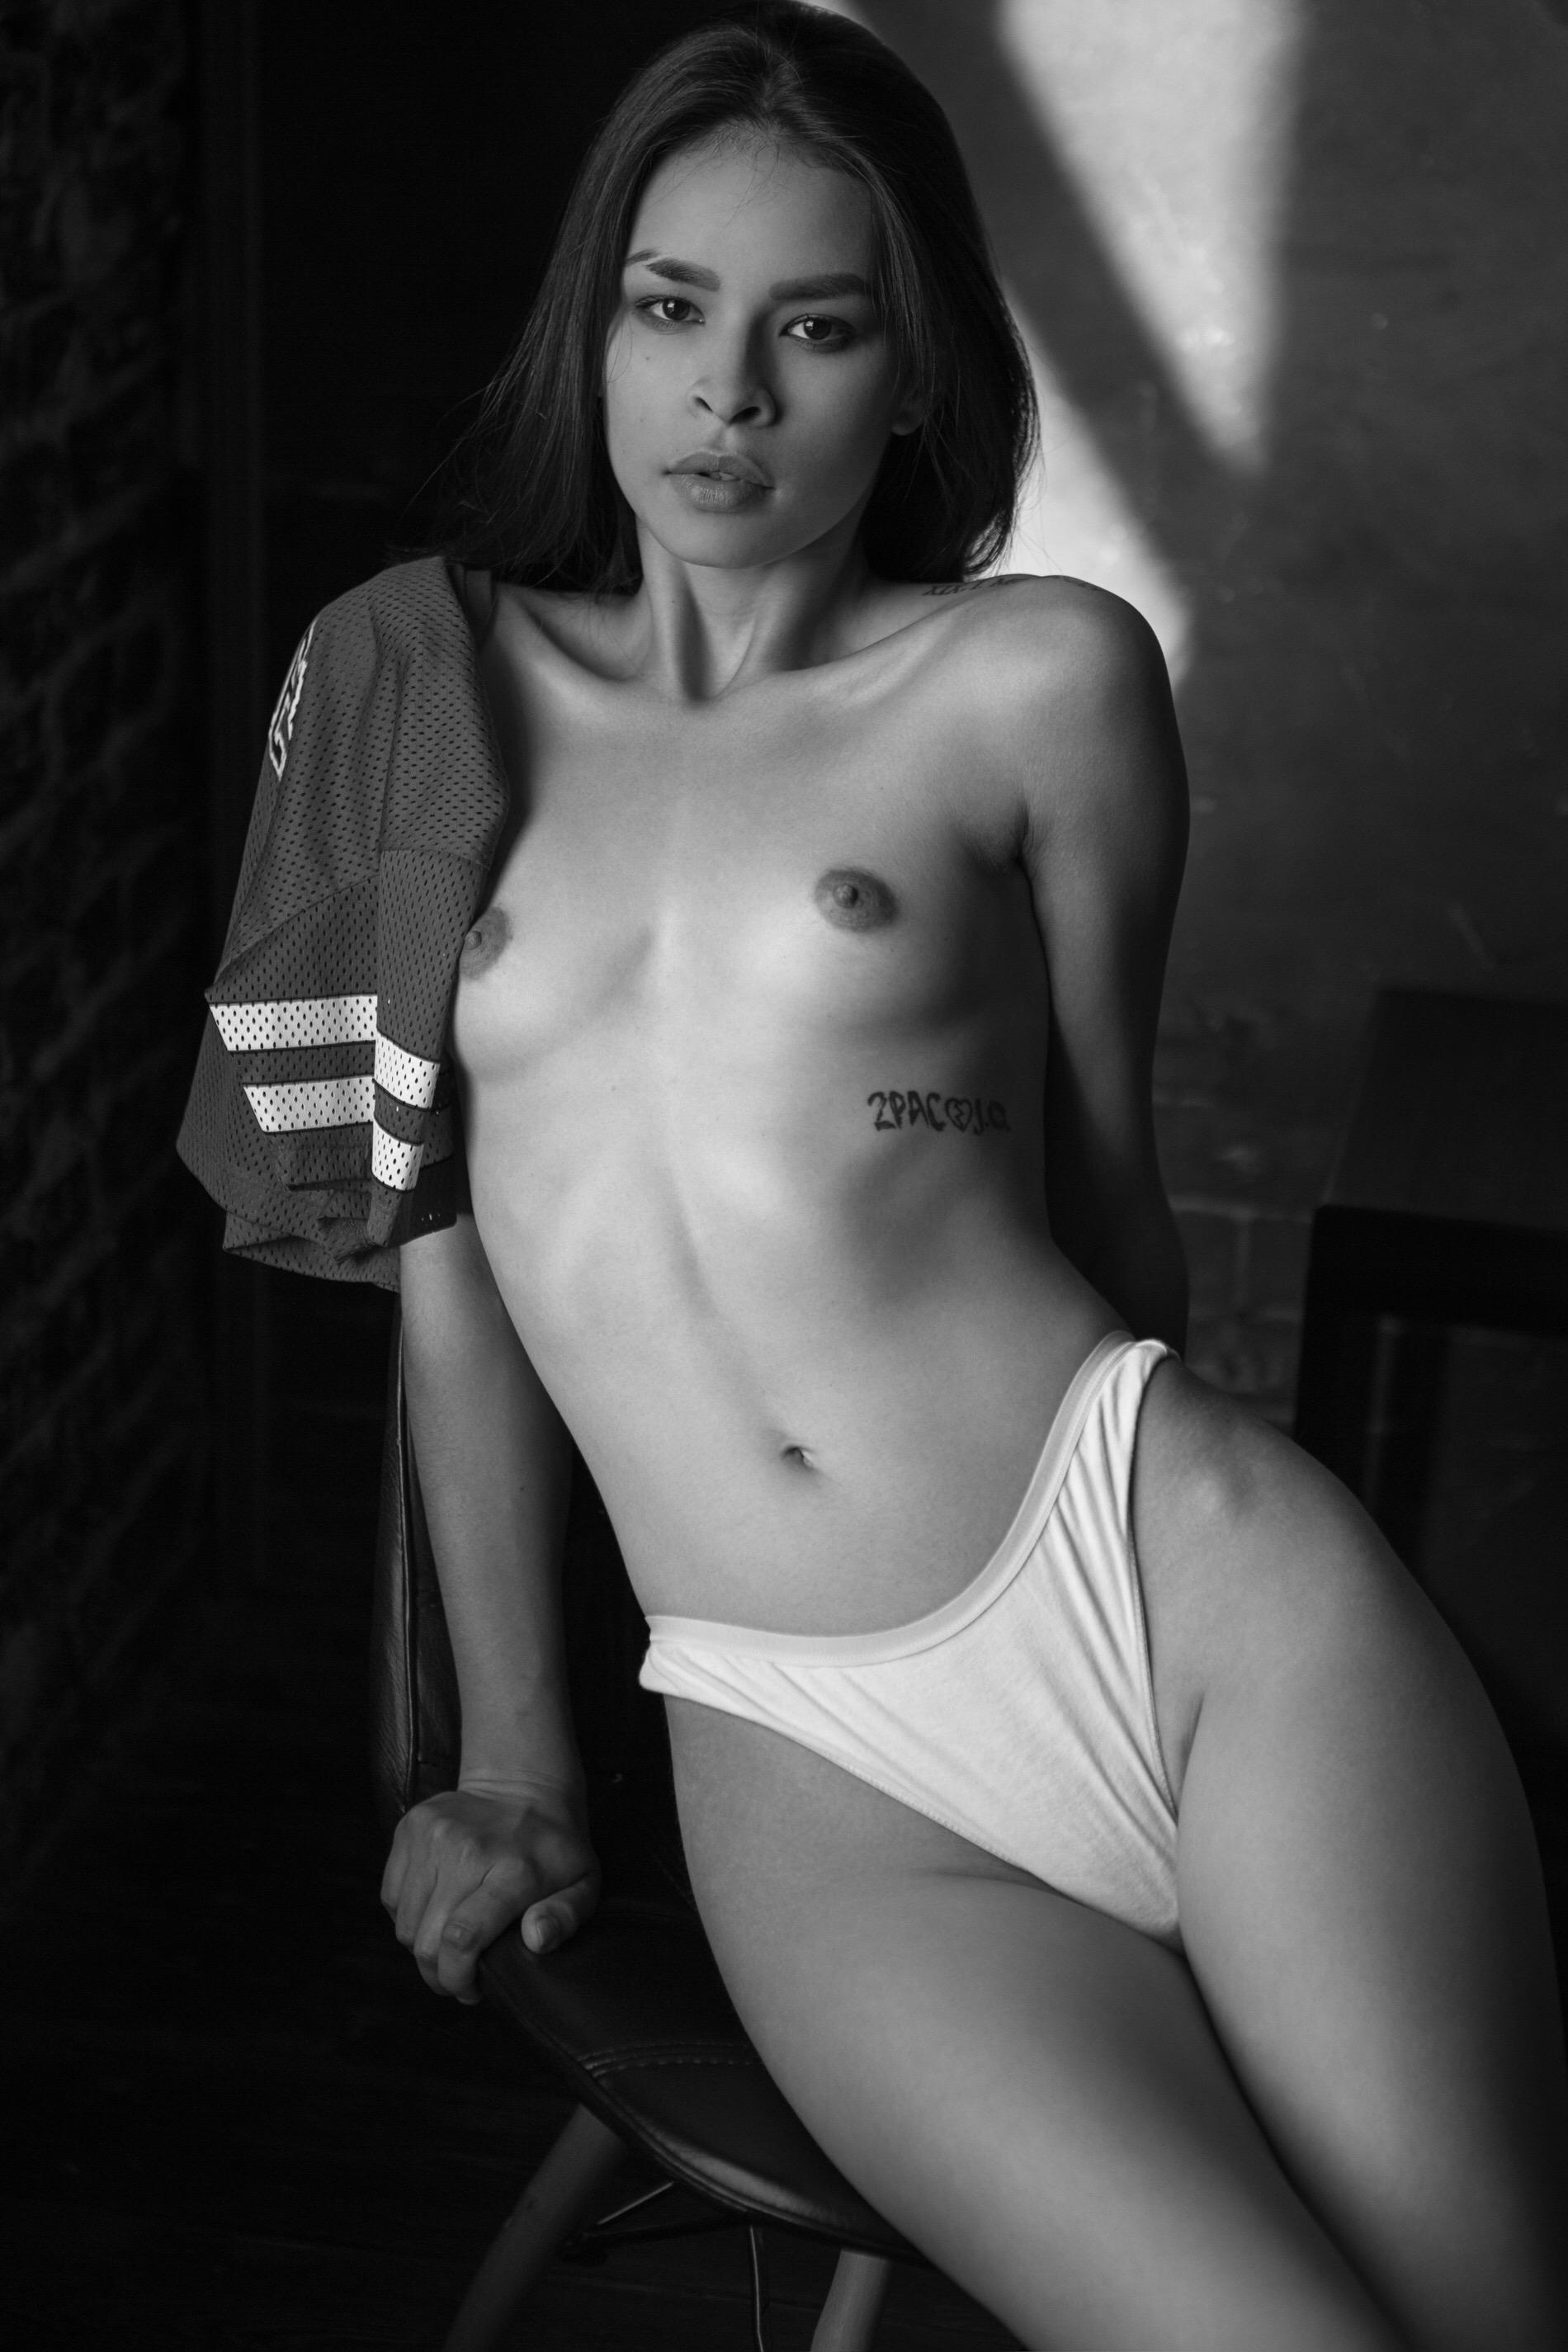 Iuliia Bast - Alex Nemalevich photoshoot